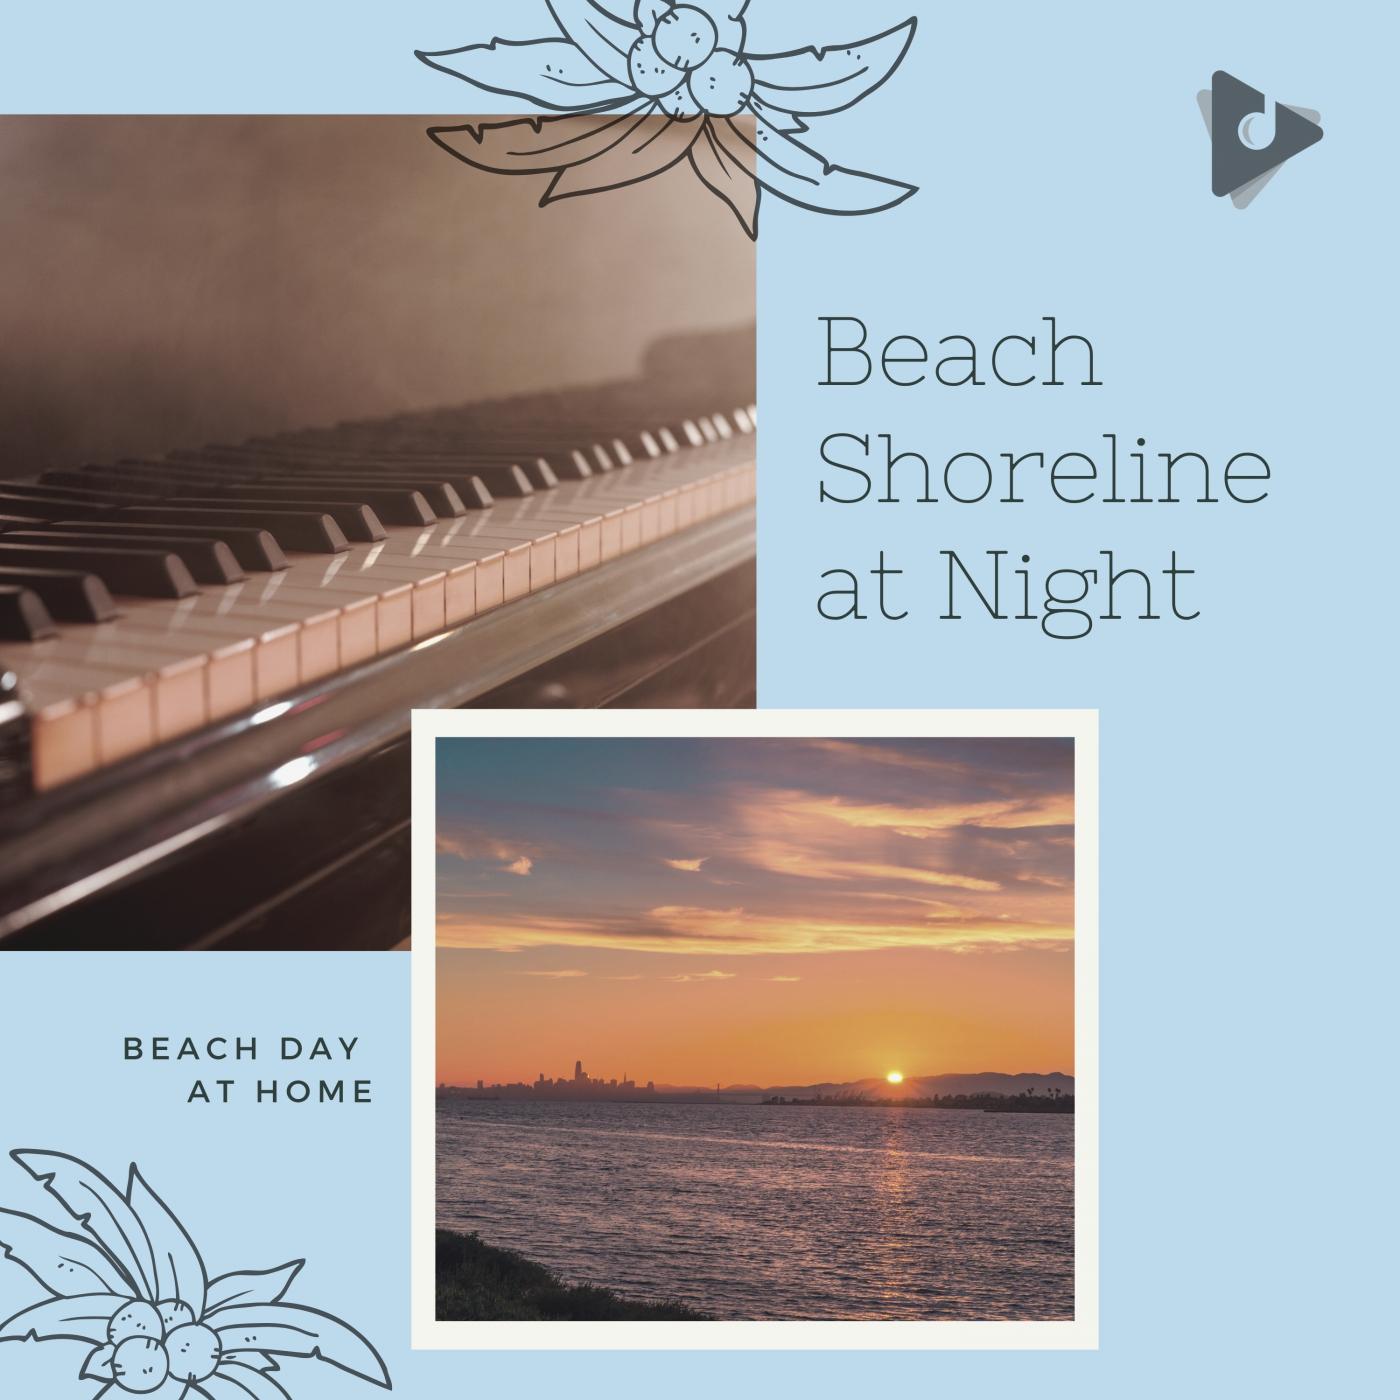 Beach Shoreline at Night